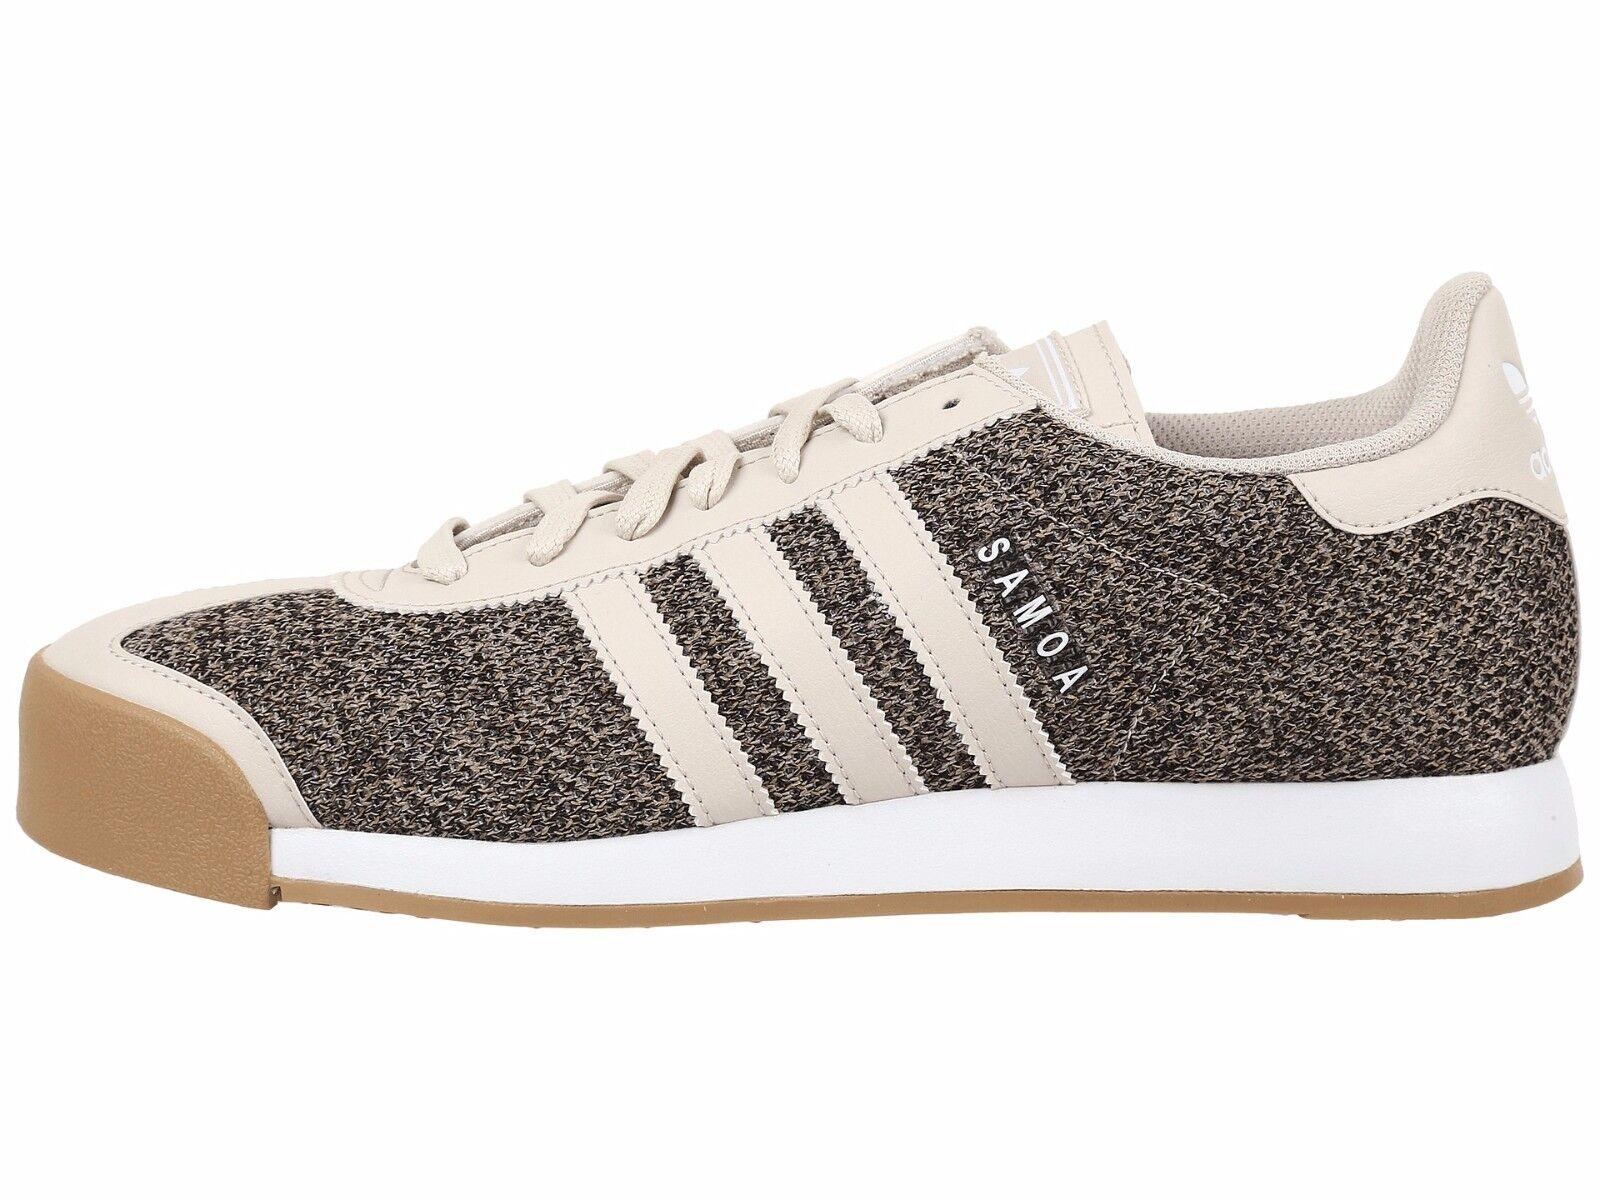 9 NEW Clear adidas Originals Samoa Textile Clear NEW Brown Gum White BB8599 superstar 678751